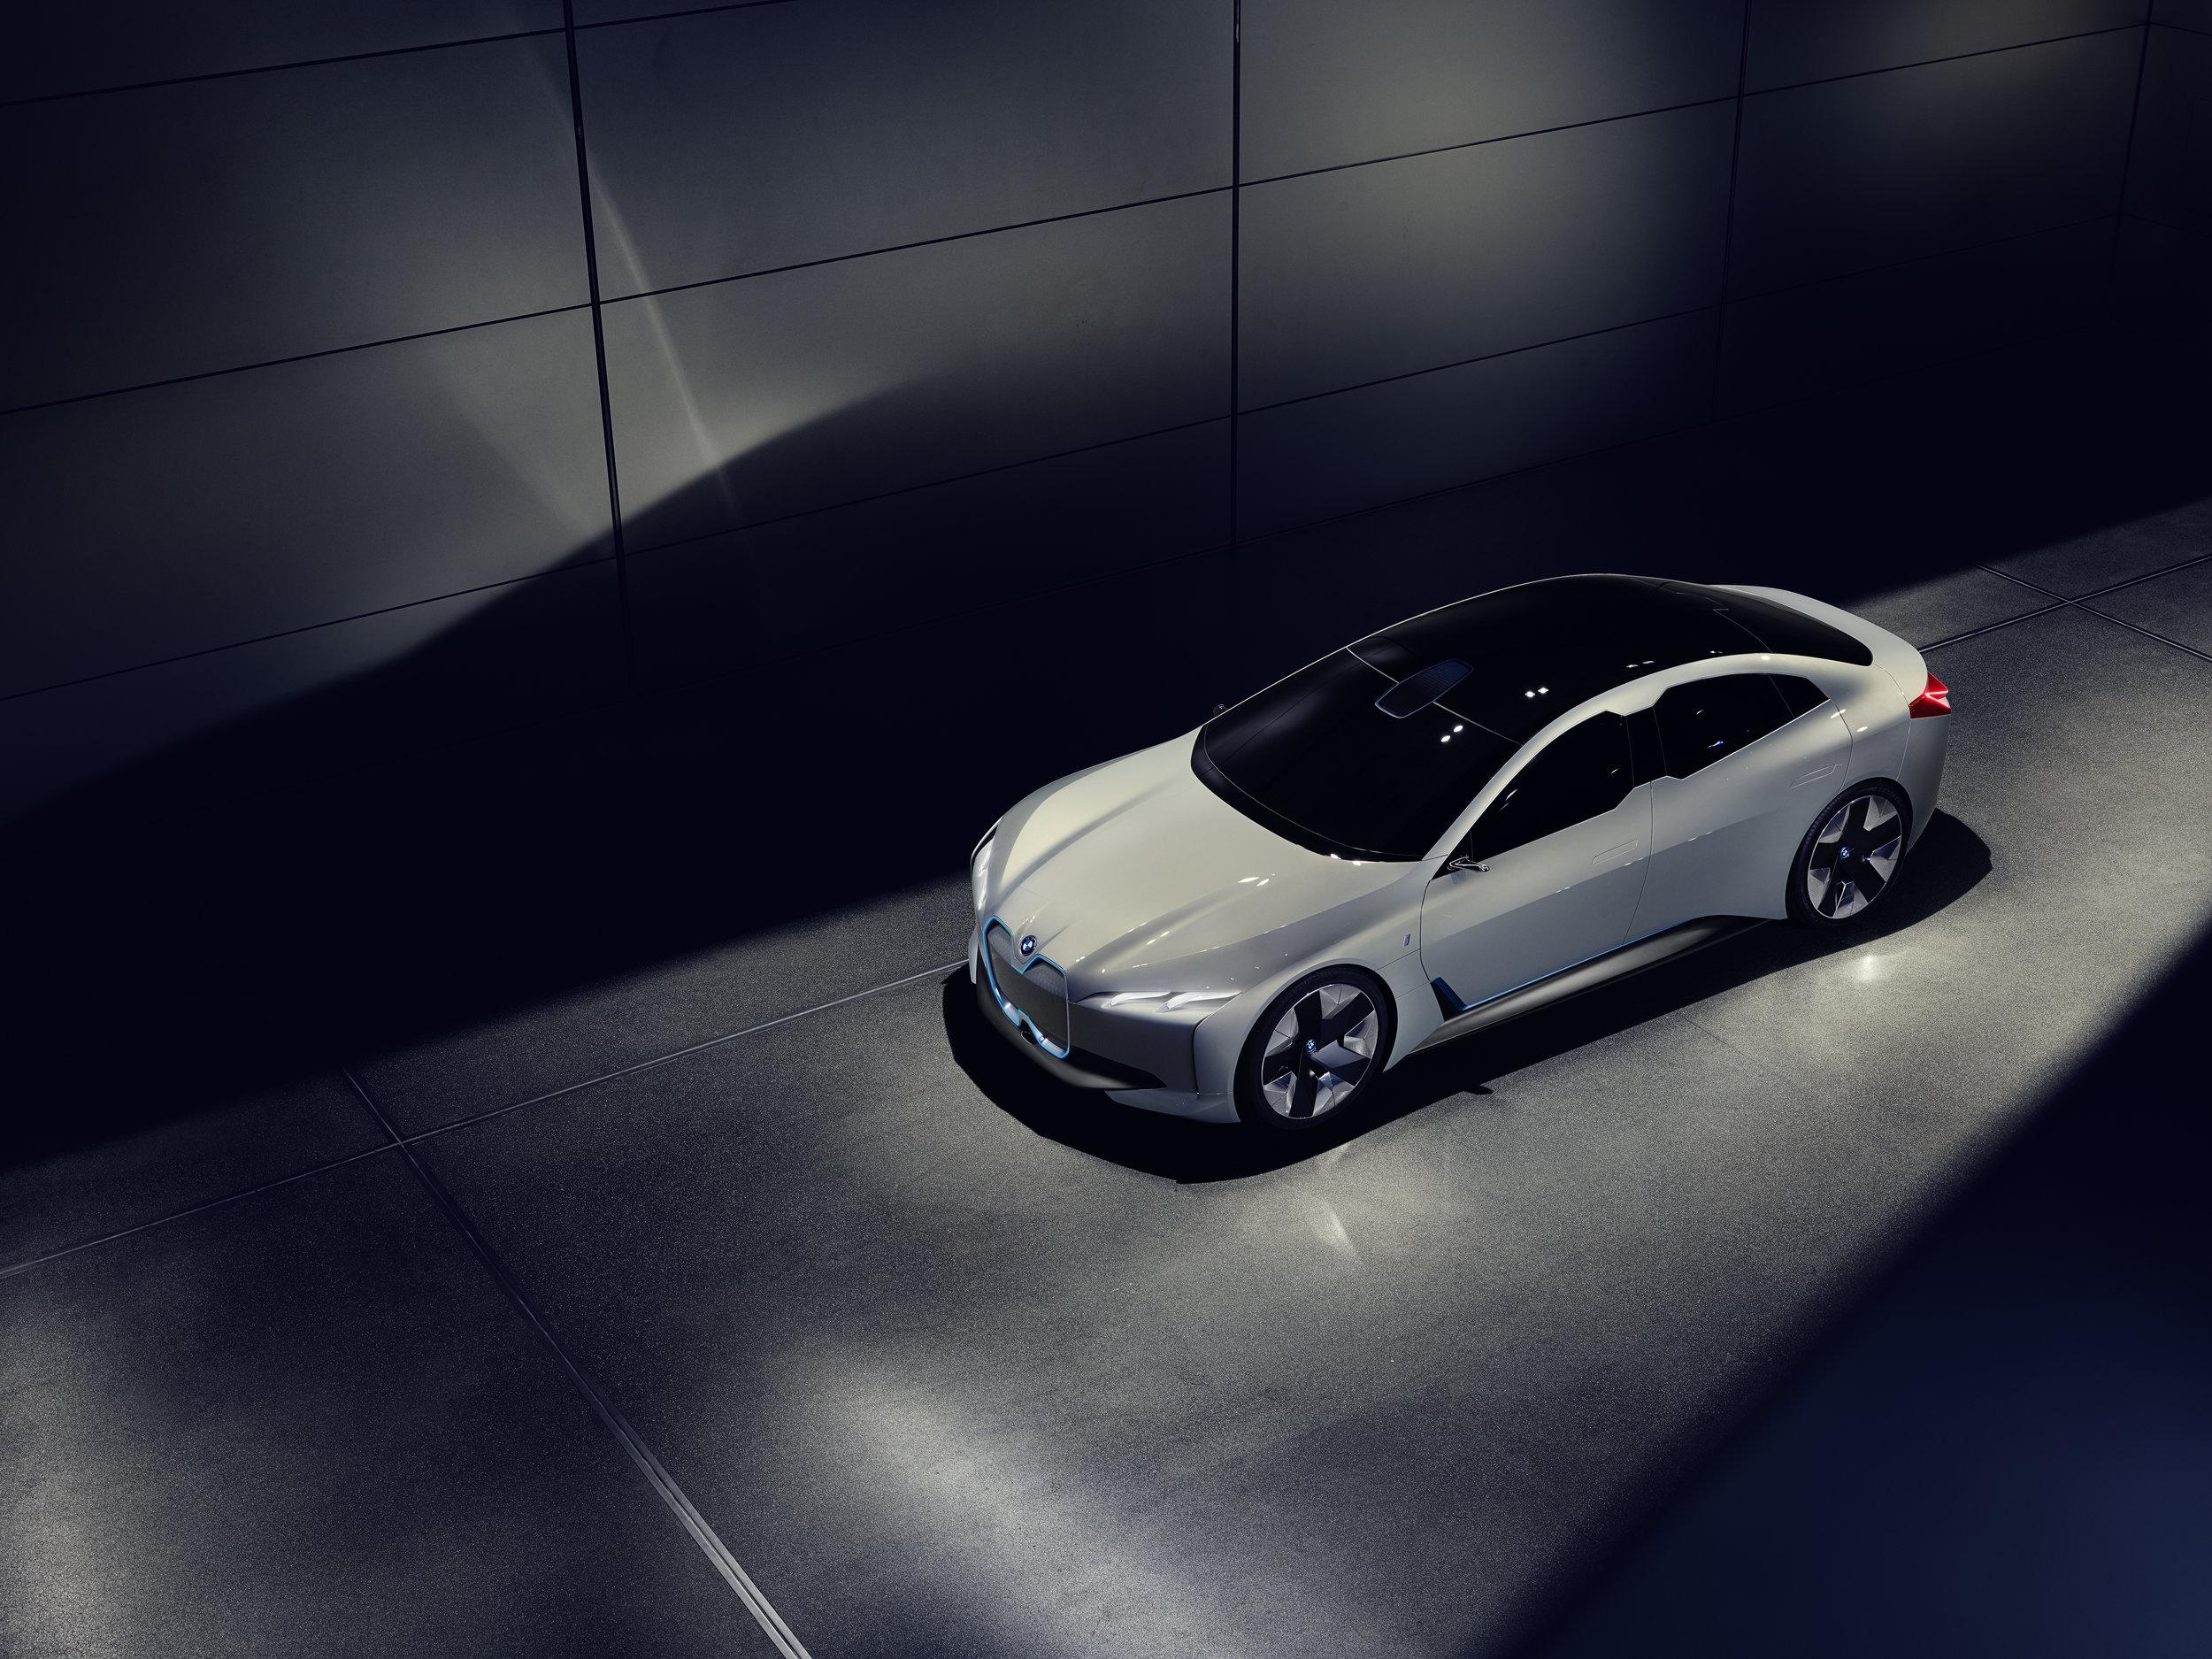 BMW_i_Vision_Dynamics_Real_V2_004.jpg